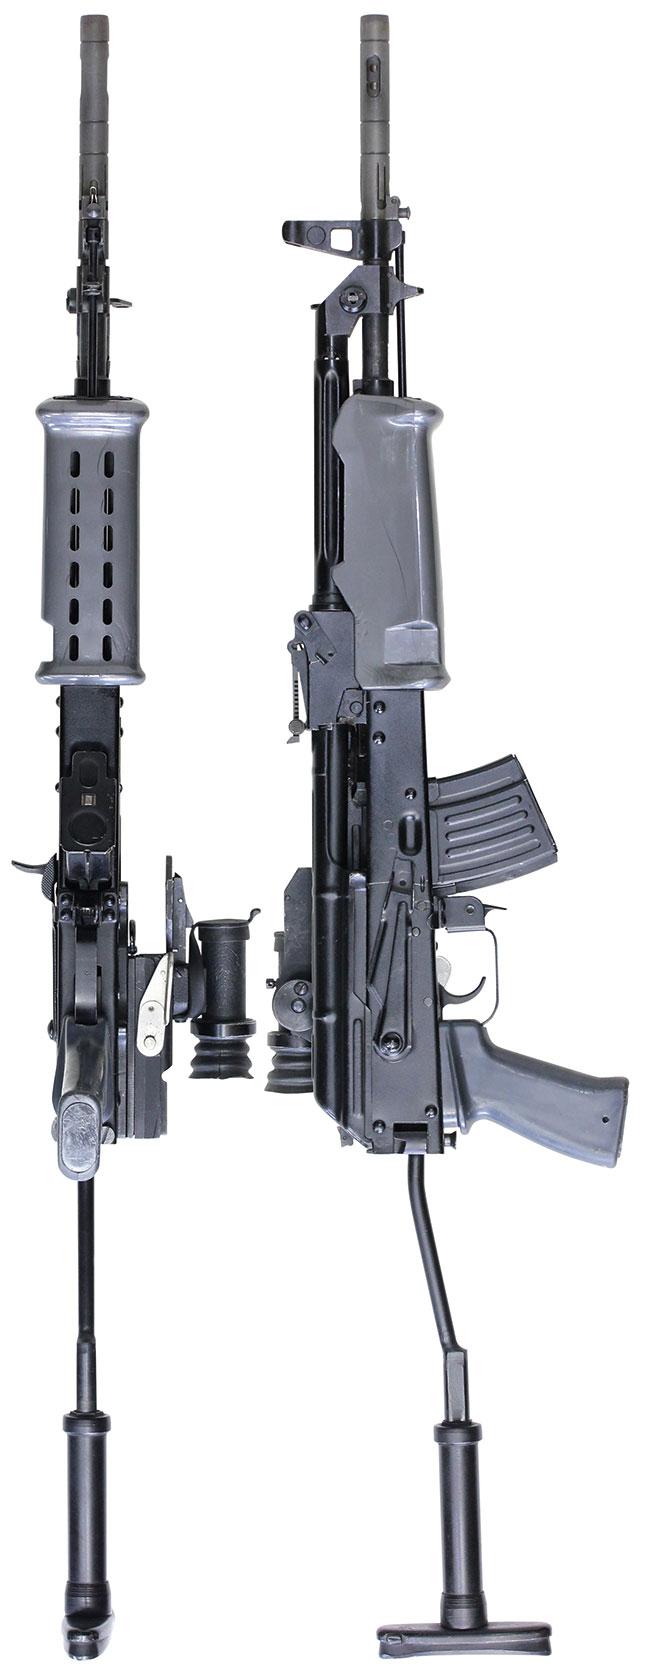 s-【3460】ハンガリー-AMP69-自動小銃-(複数在庫品、#KP0895)右.jpg